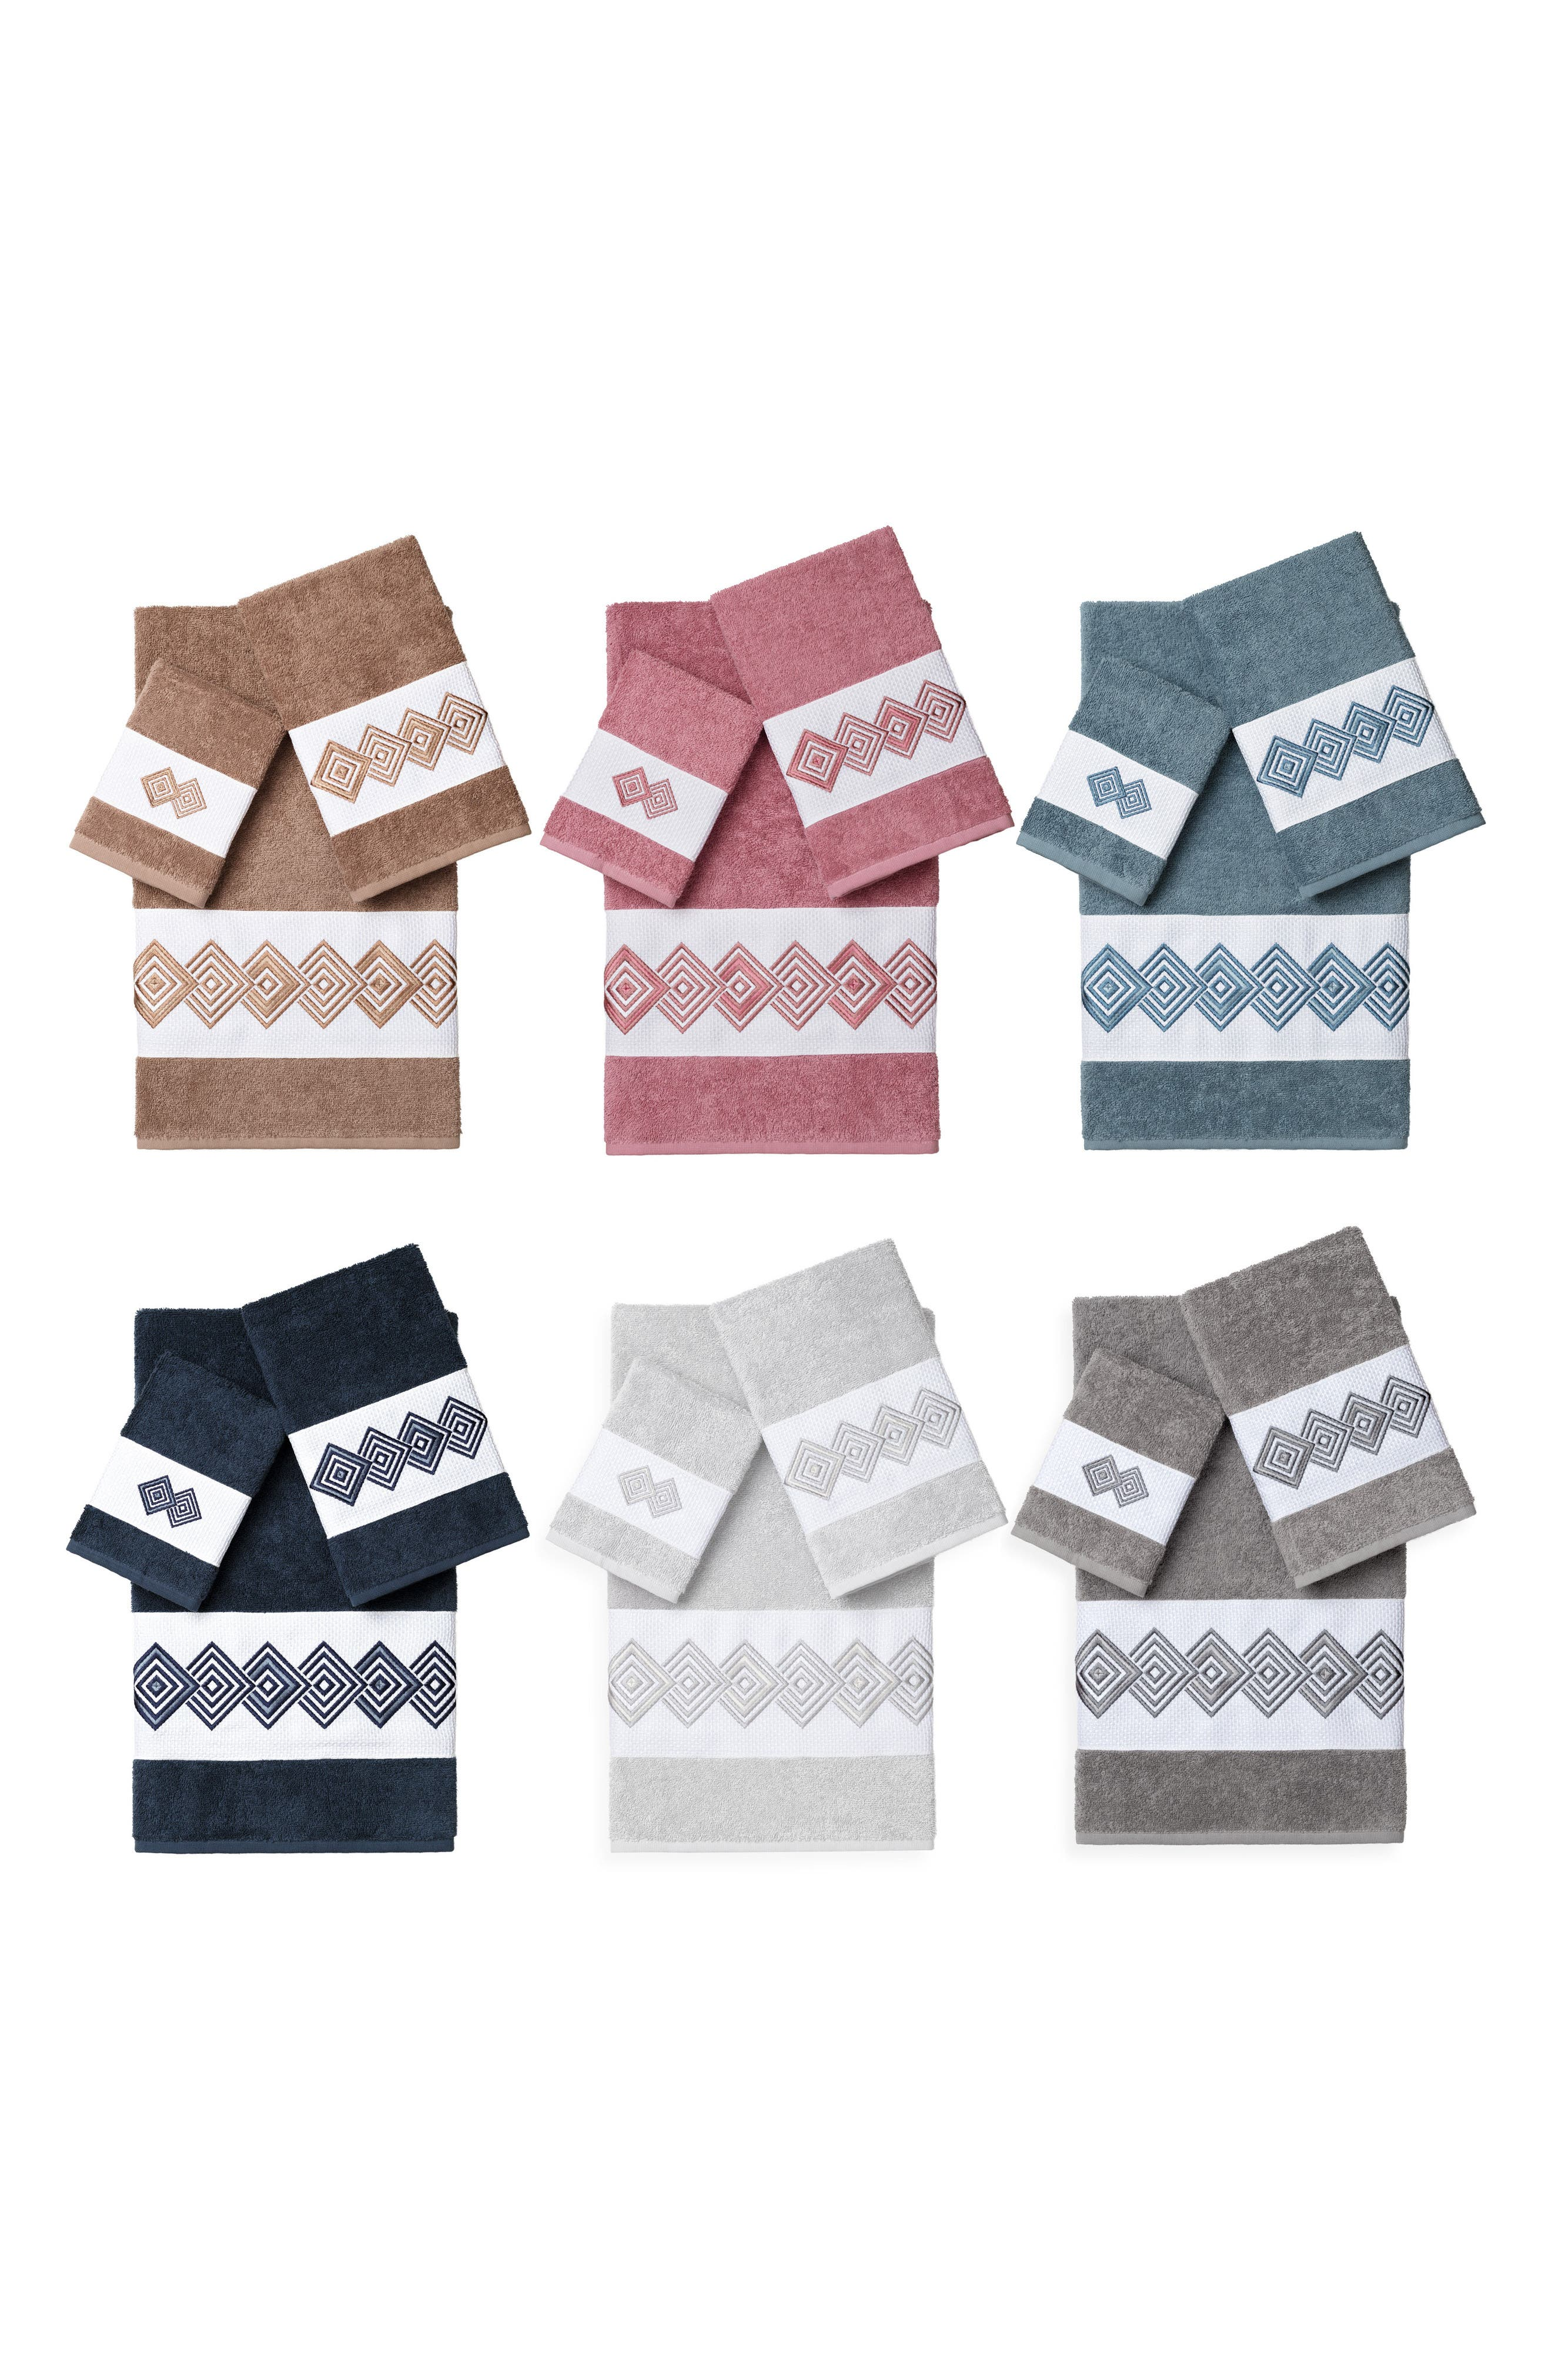 Noah 3-Piece Turkish Cotton Towel Set,                             Alternate thumbnail 3, color,                             Dark Grey